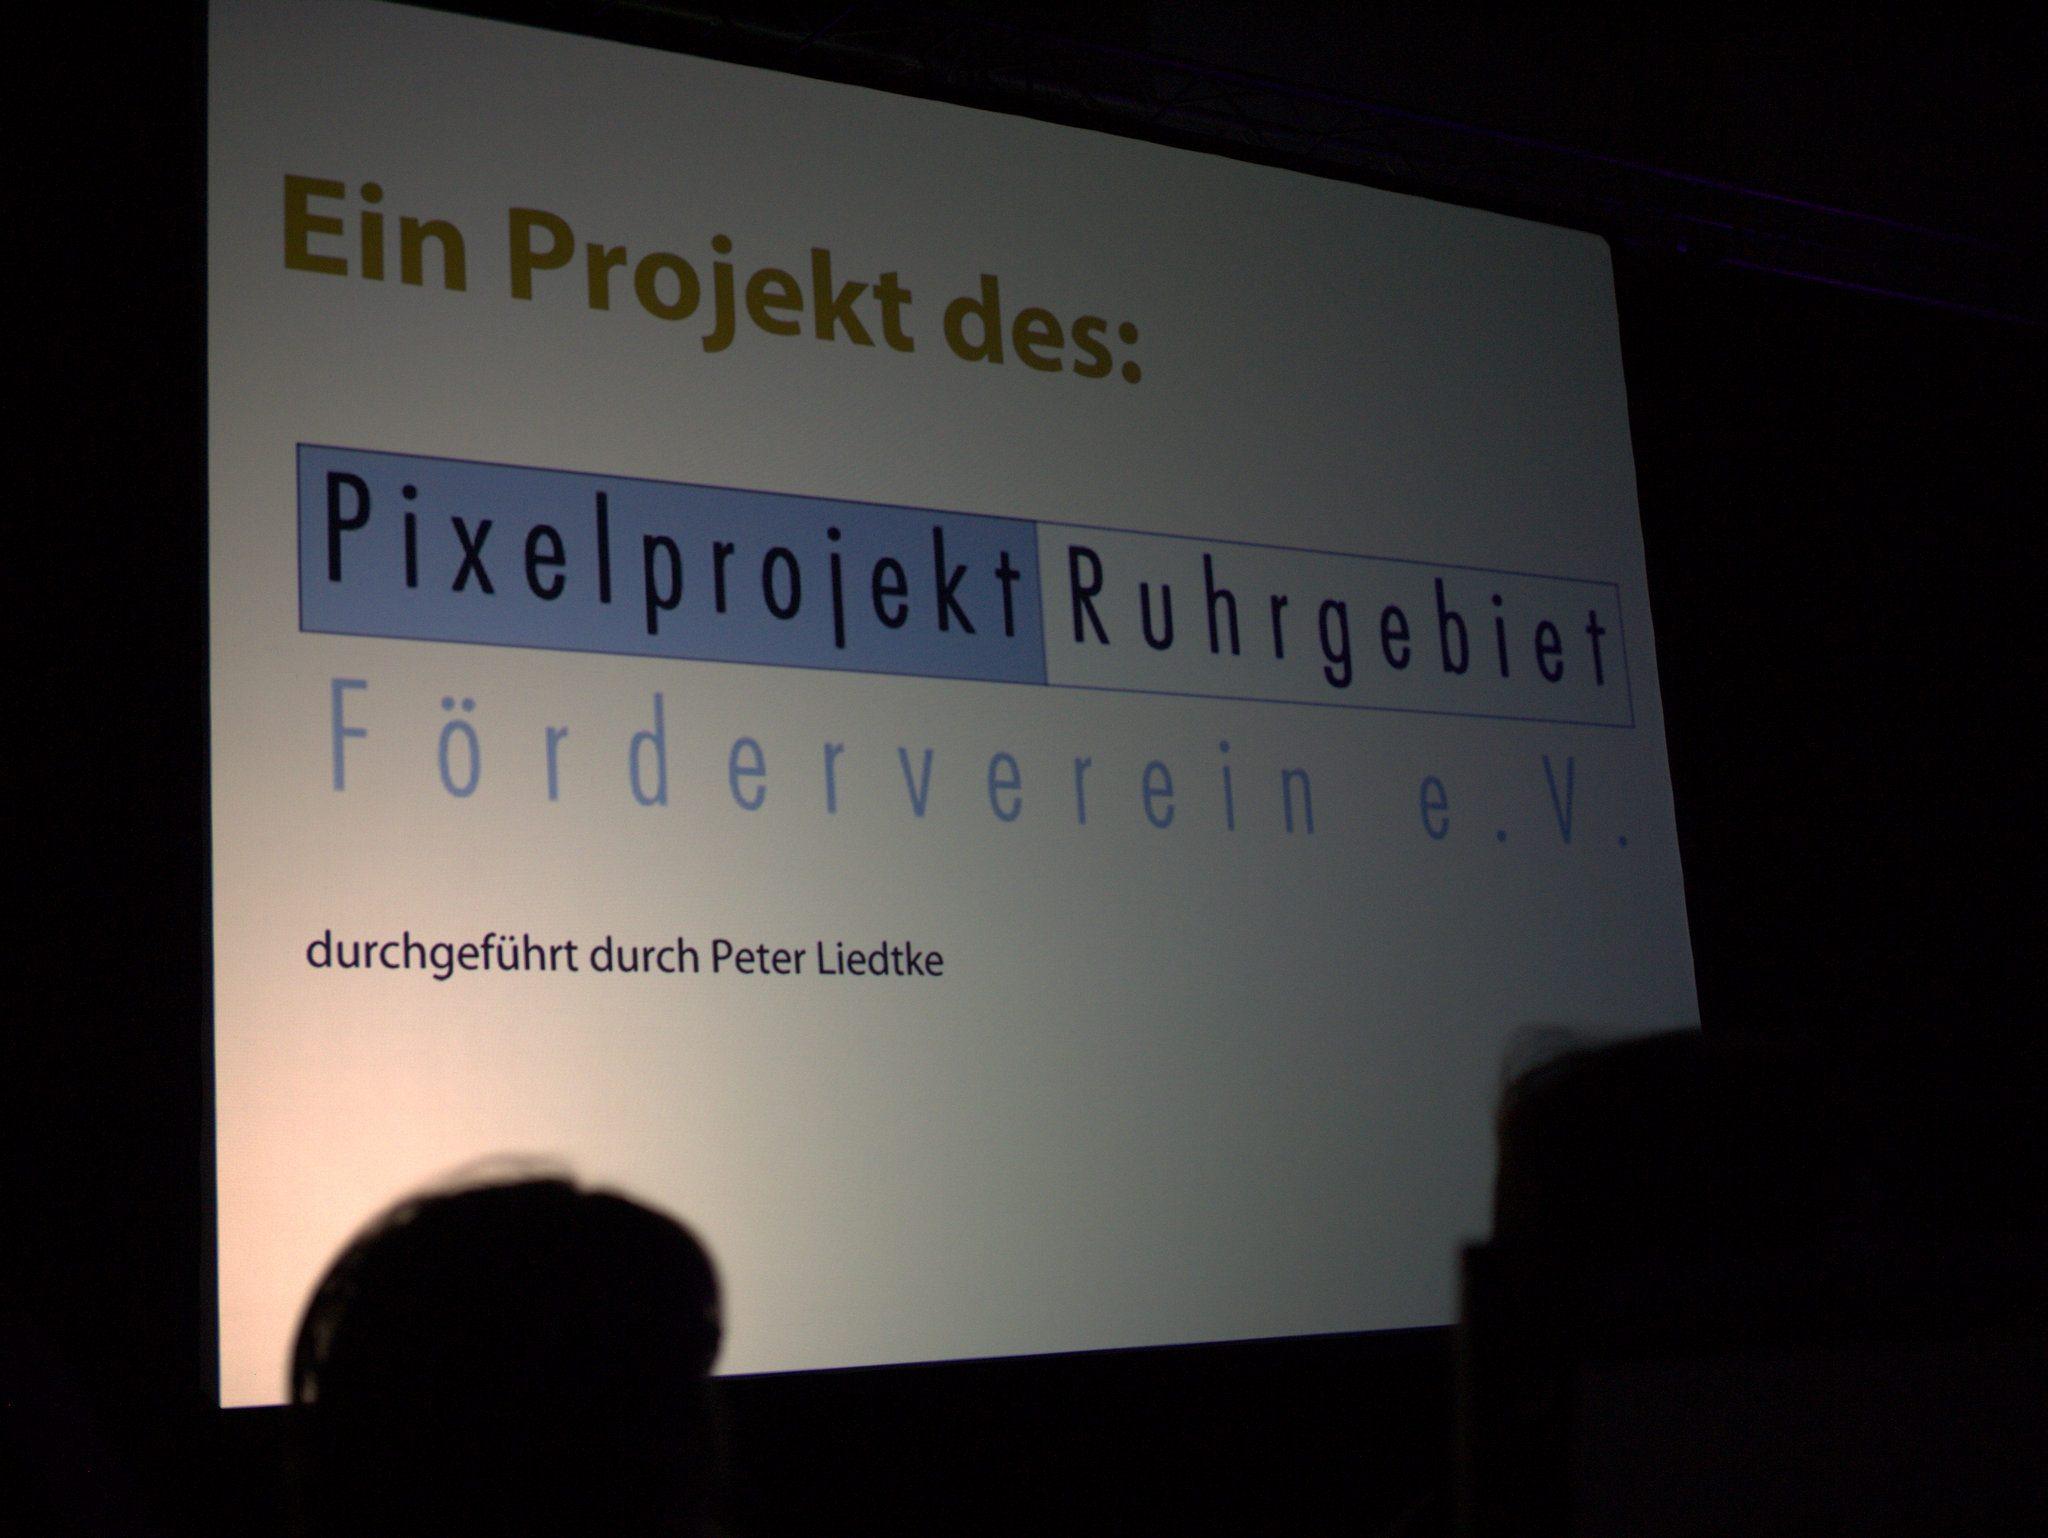 Ein Projekt des Pixelprojekt Ruhrgebiet Förderverein e.V.